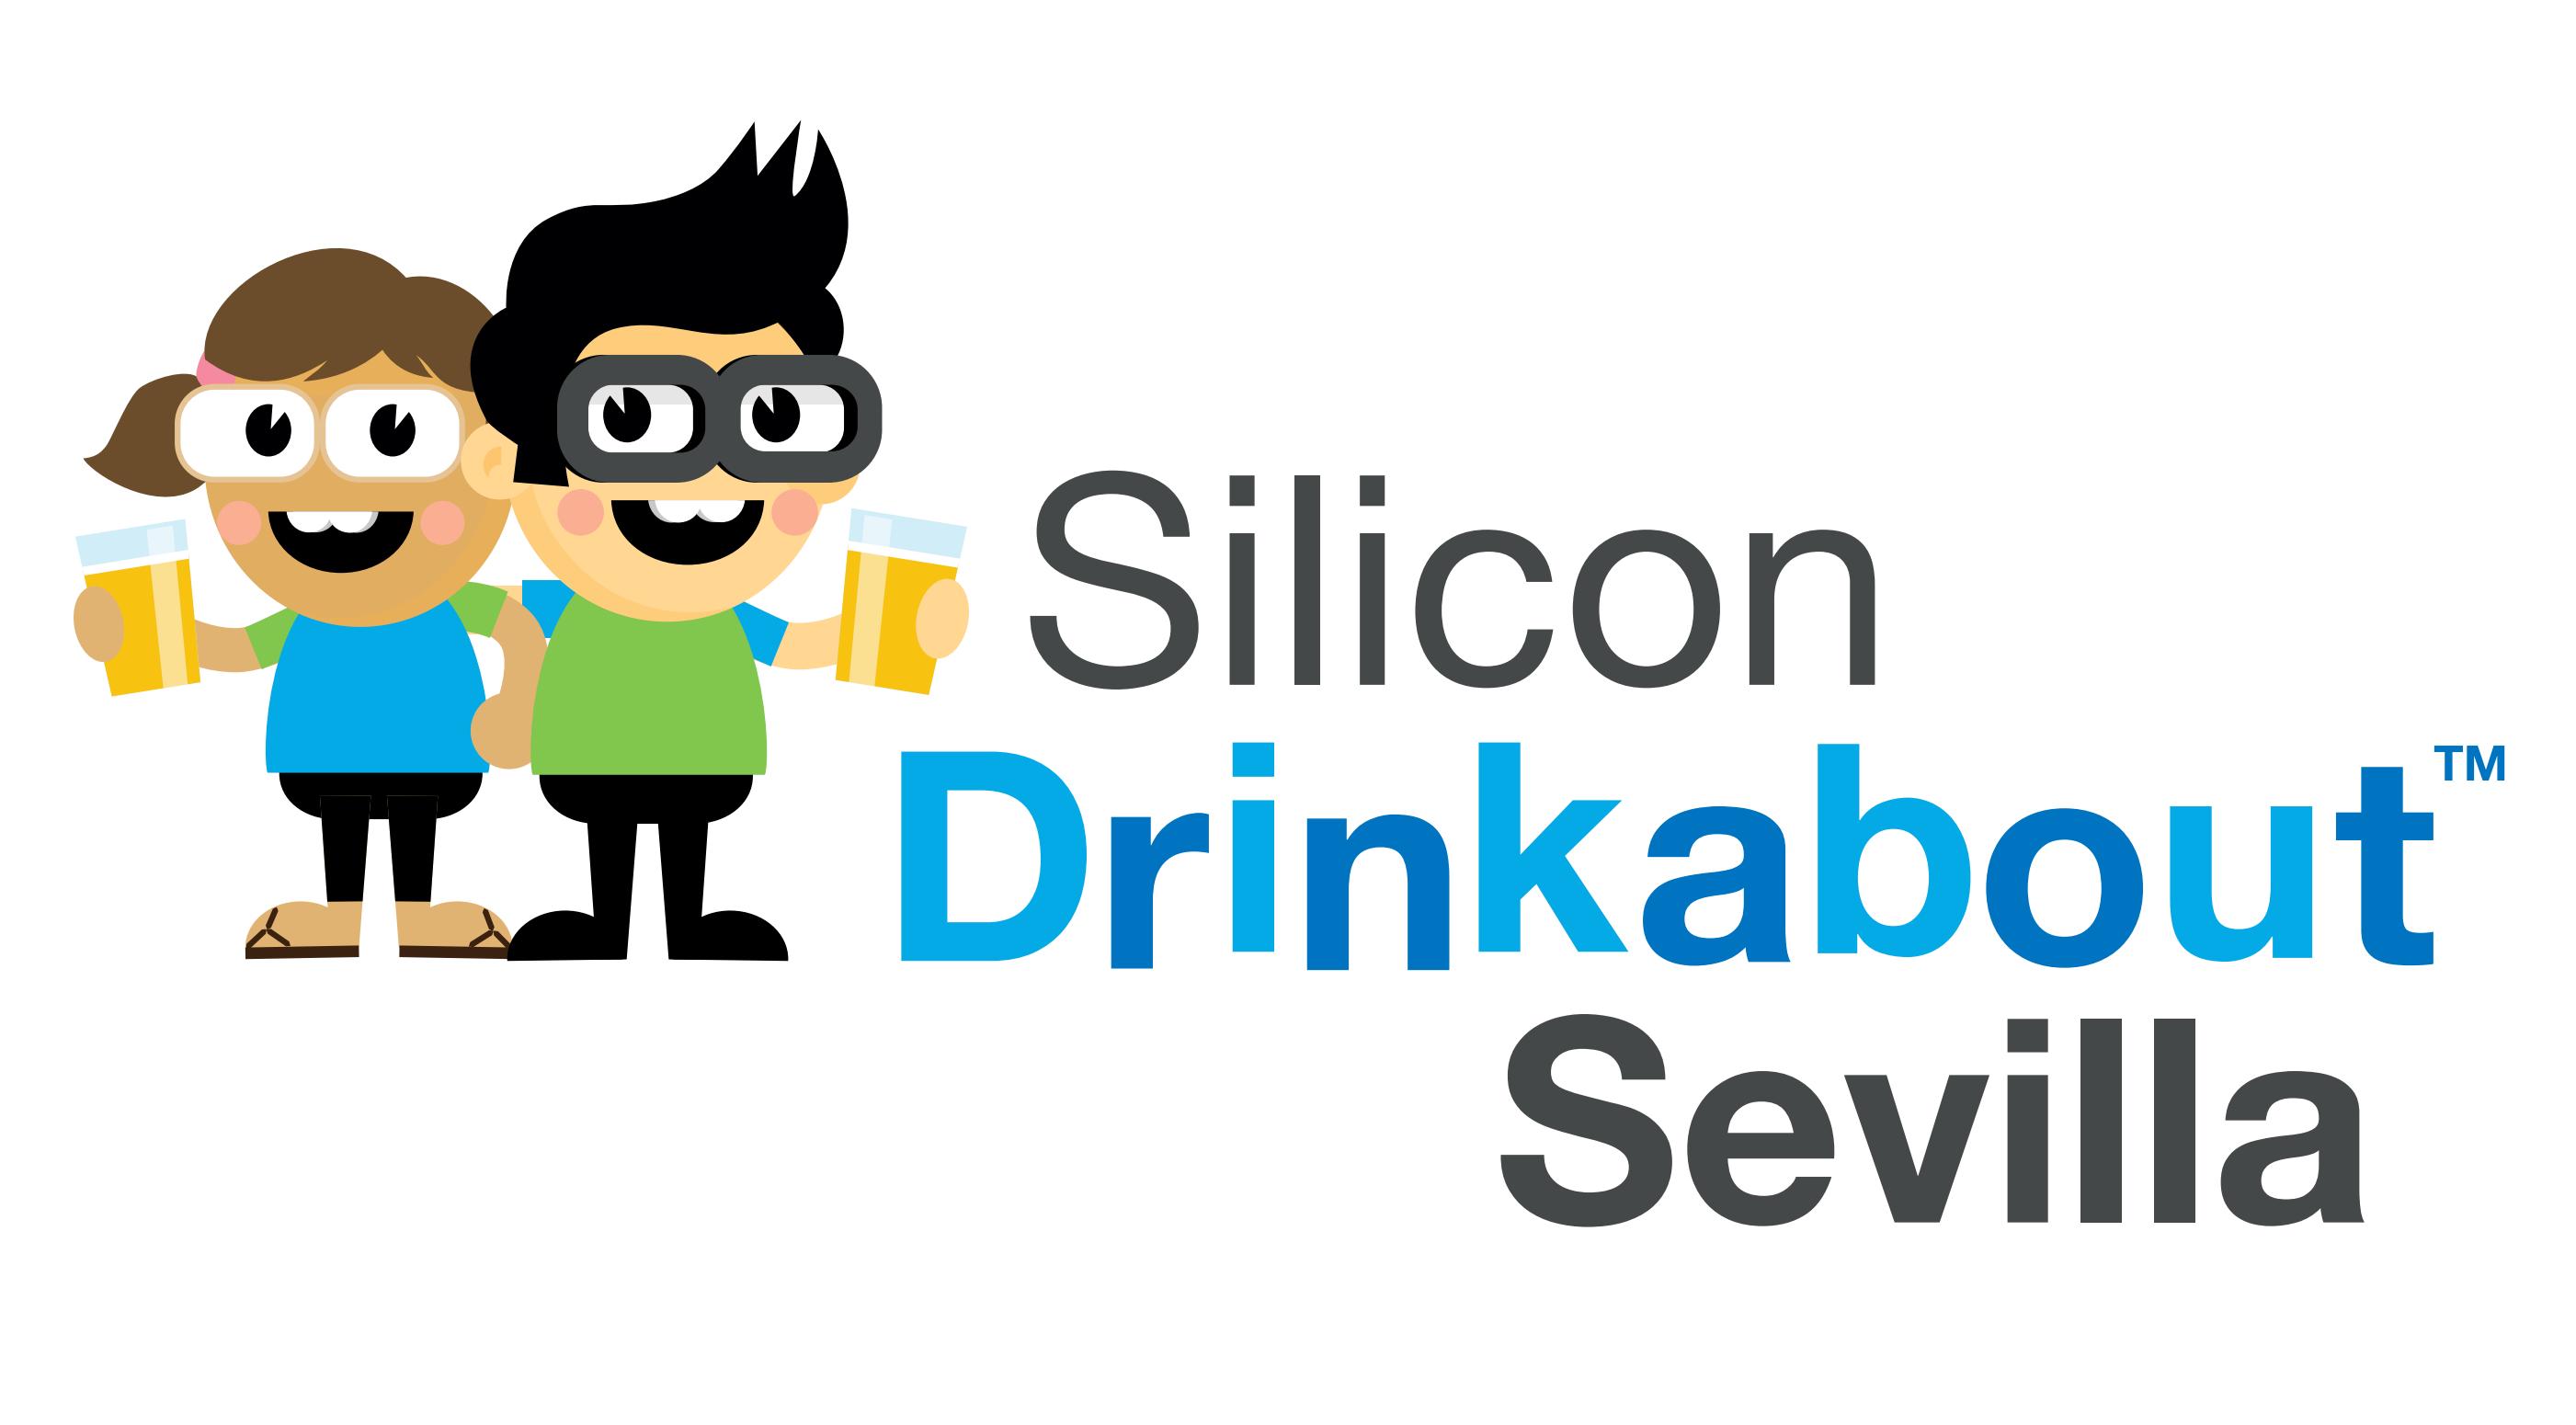 Silicon Drinkabout Sevilla